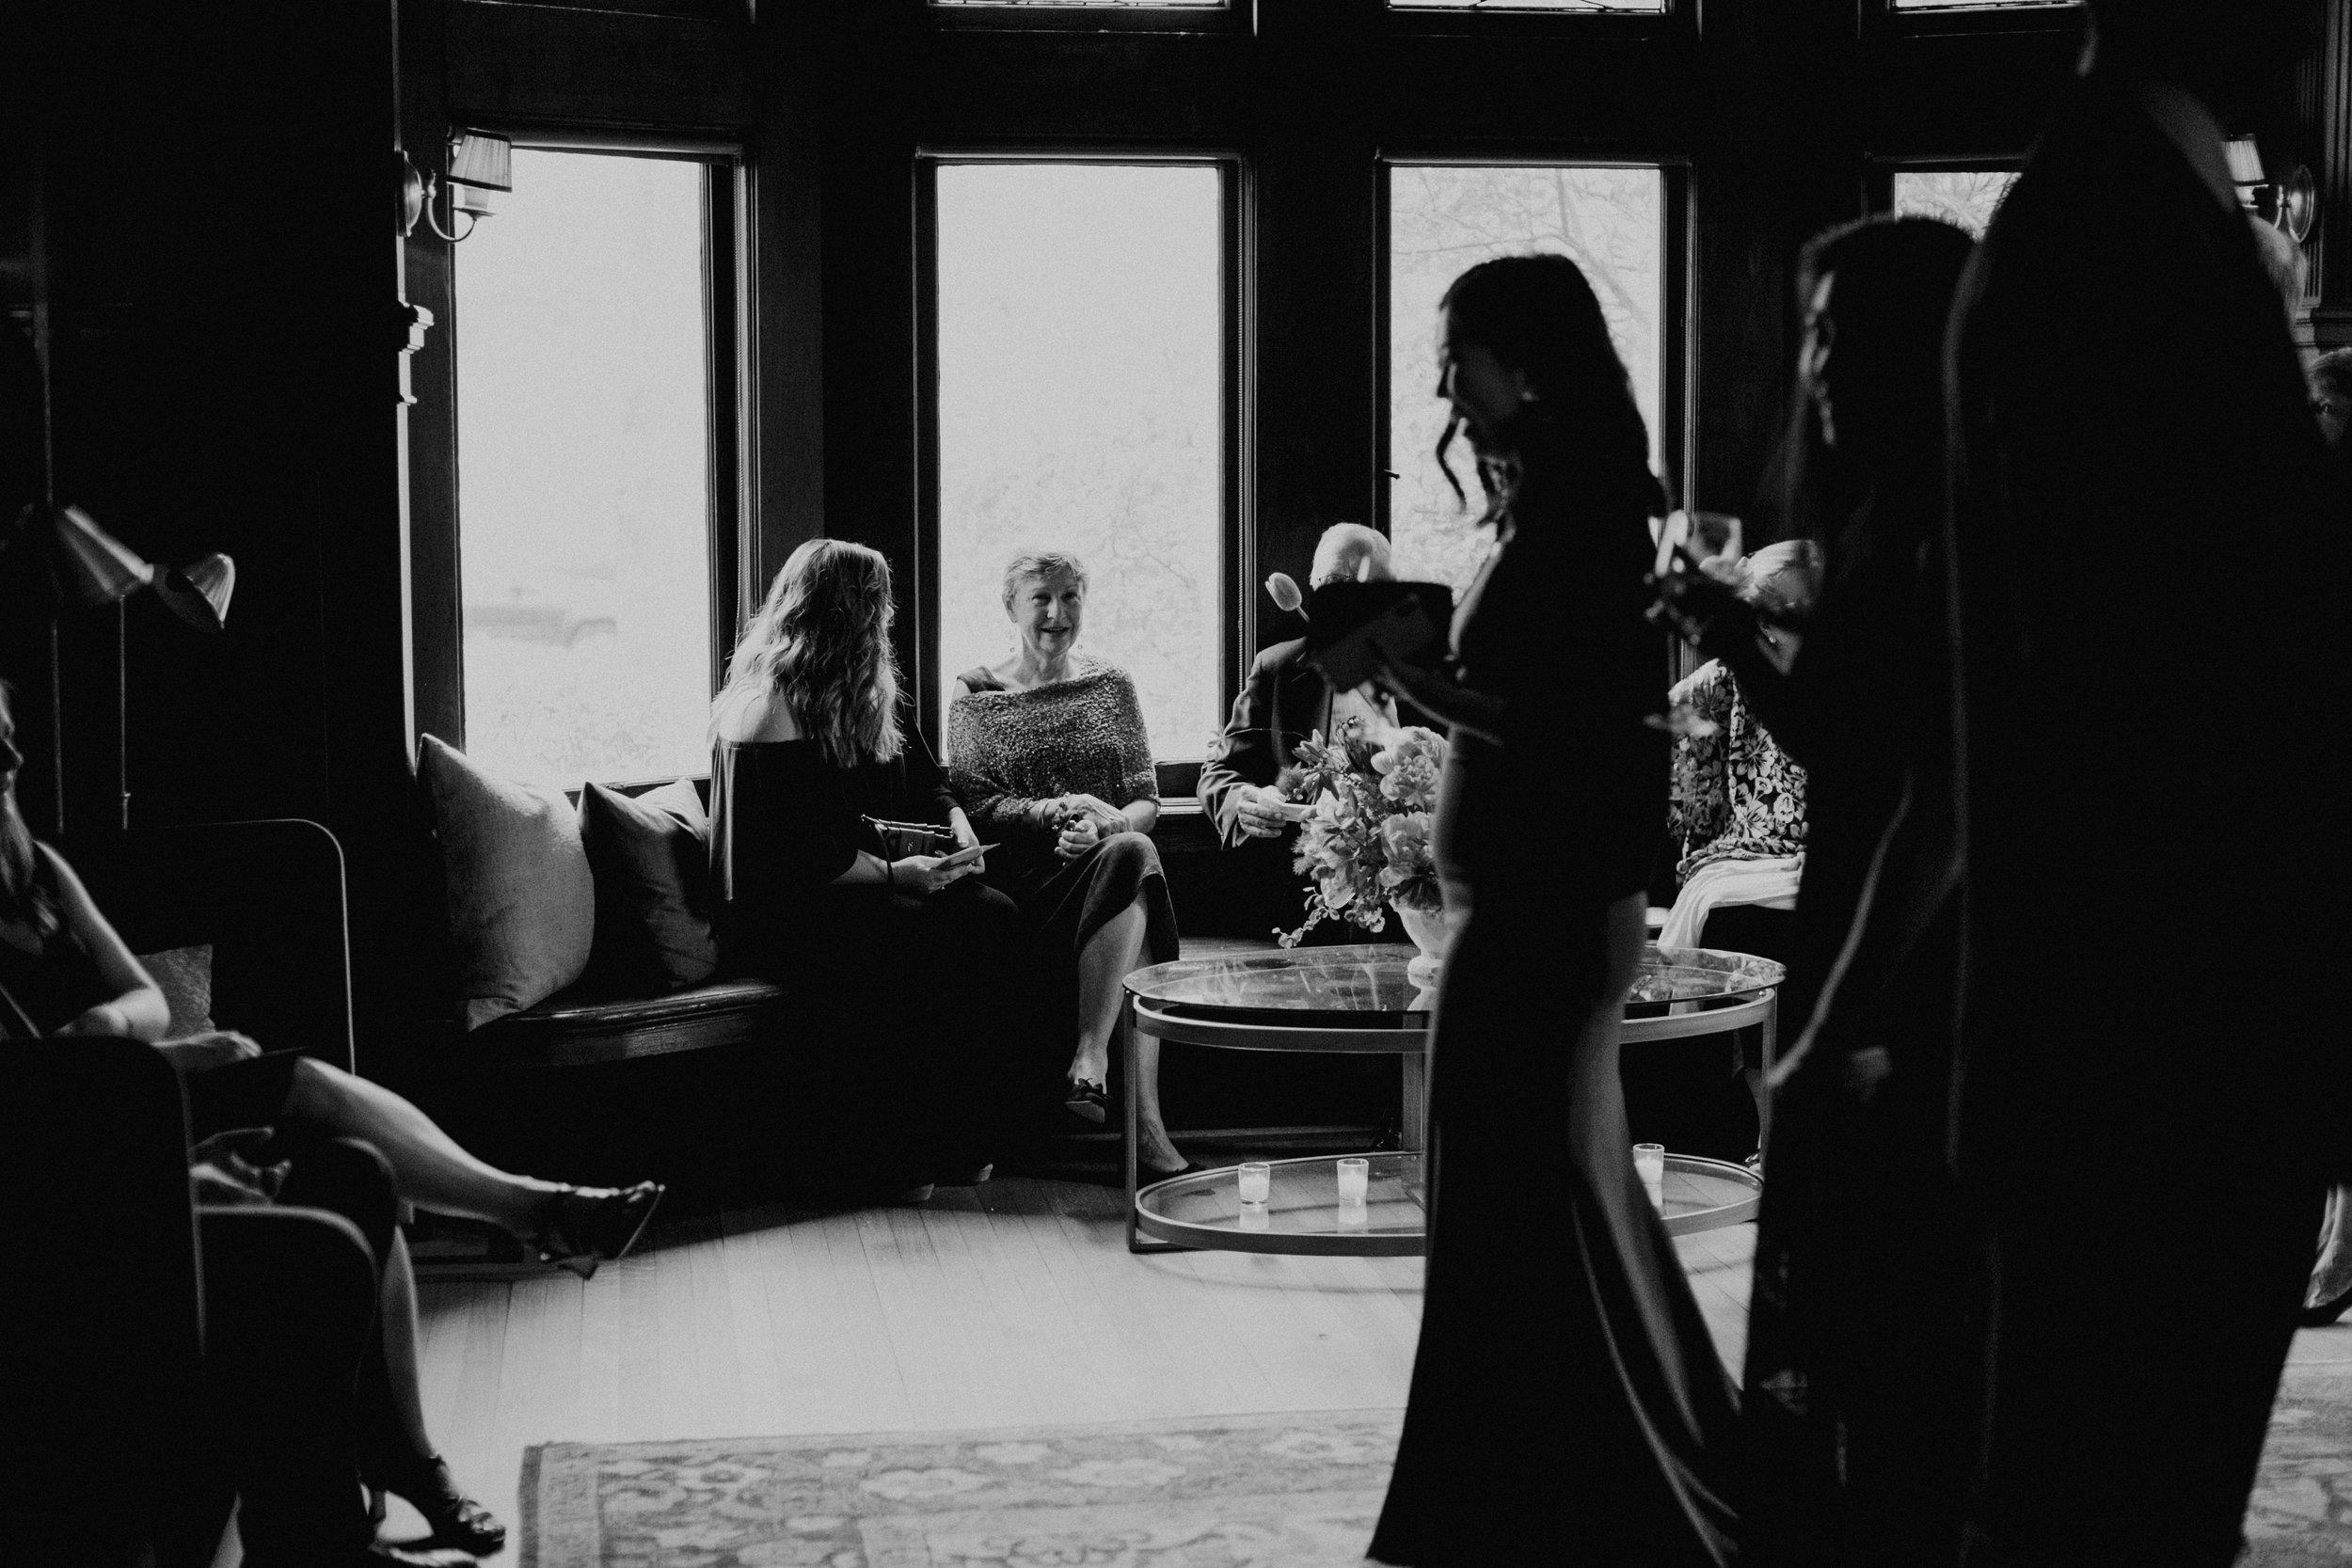 Tiger_House_The_Inn_at_Hudson-Wedding_Chellise_Michael_Photography-285.jpg